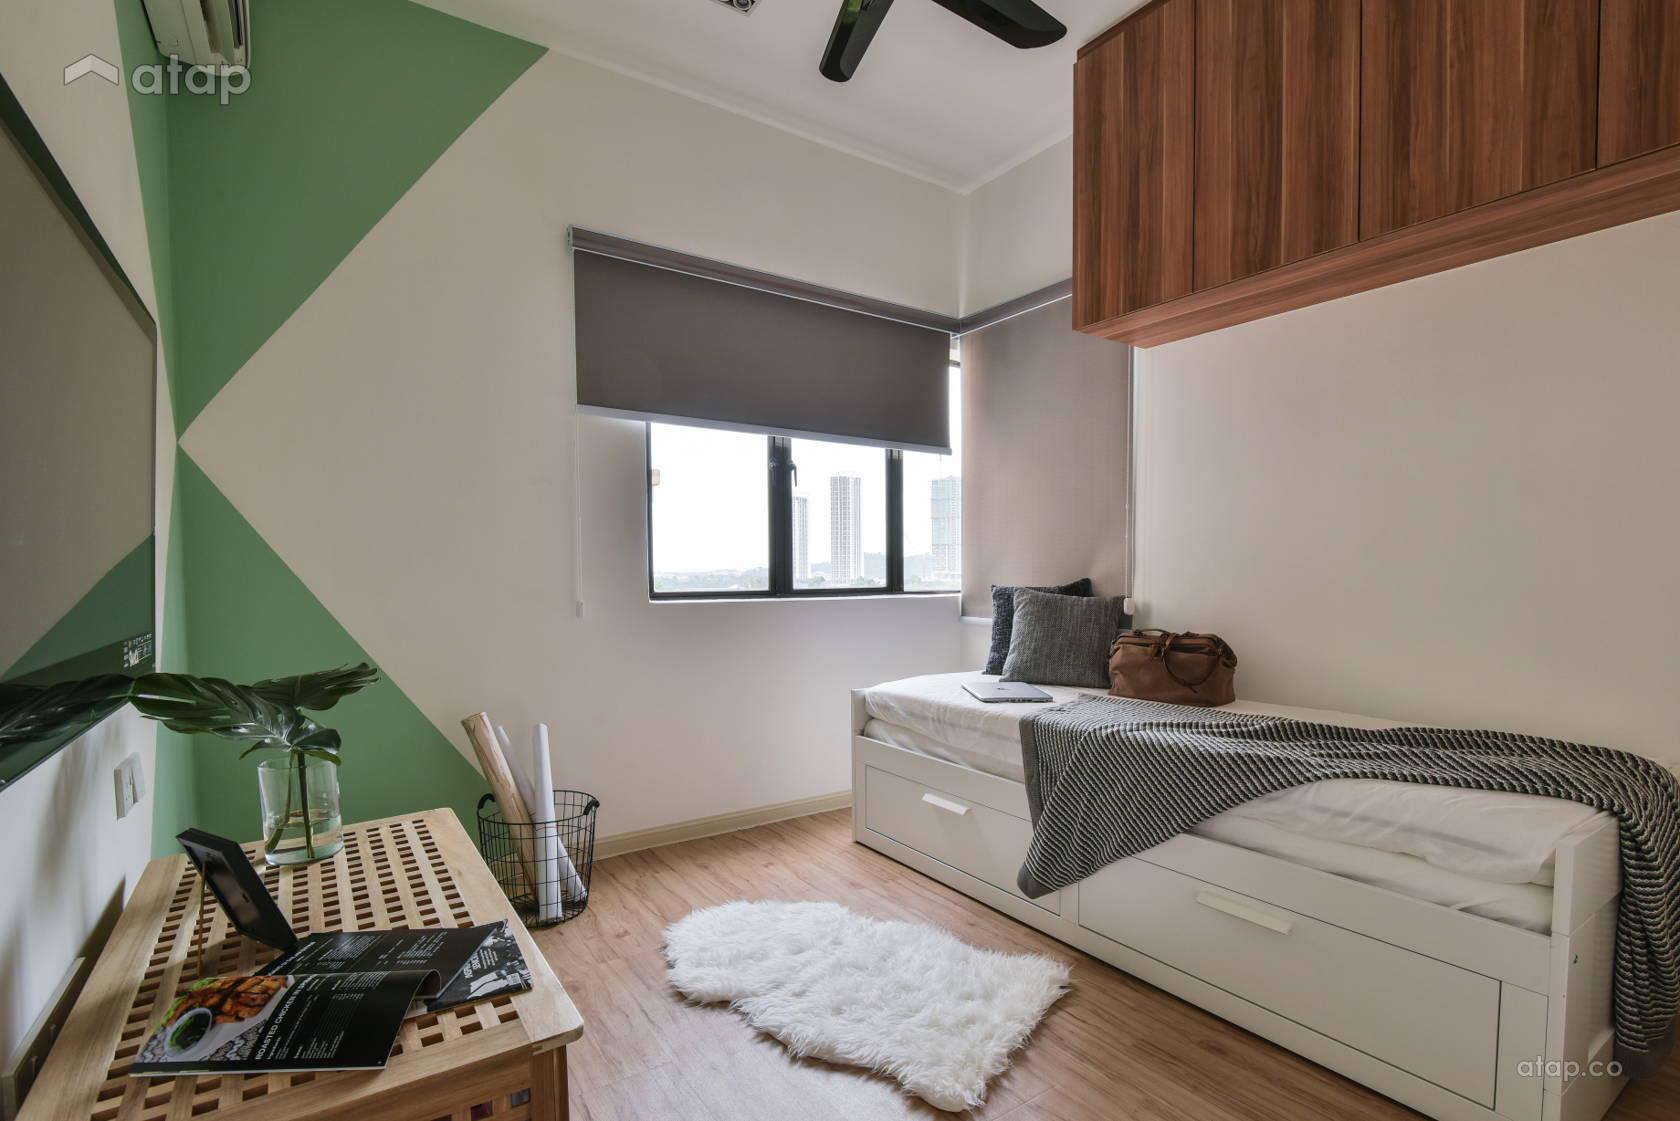 simplicity home interior design renovation ideas photos and price